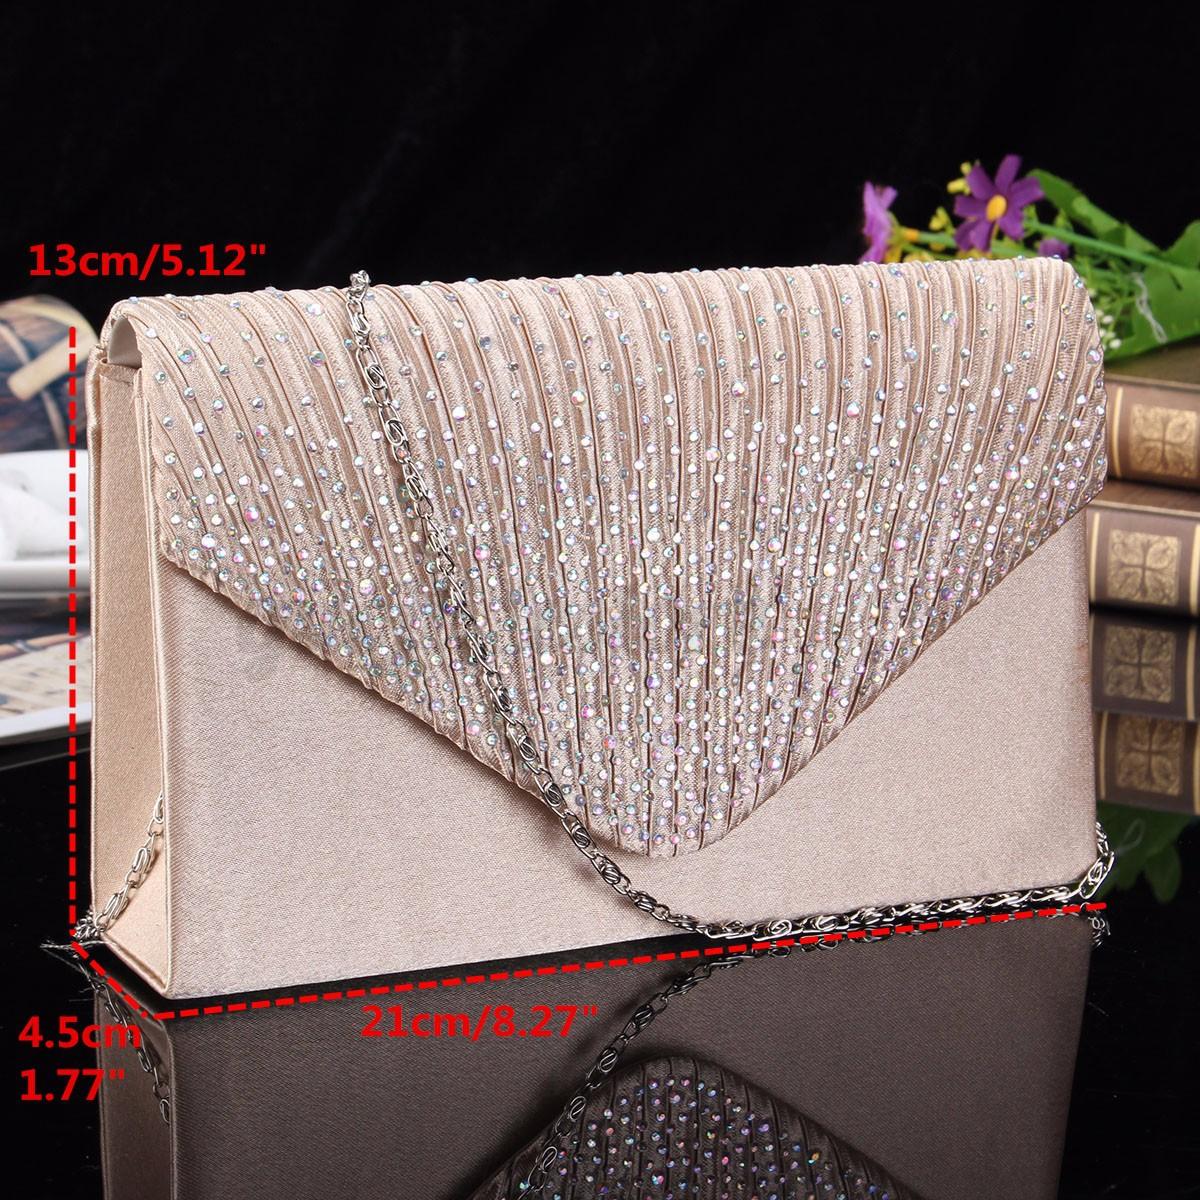 US-Women-Evening-Bag-Satin-Bridal-Clutch-Party-Envelope-Bag-Handbag-Small-Purse thumbnail 5